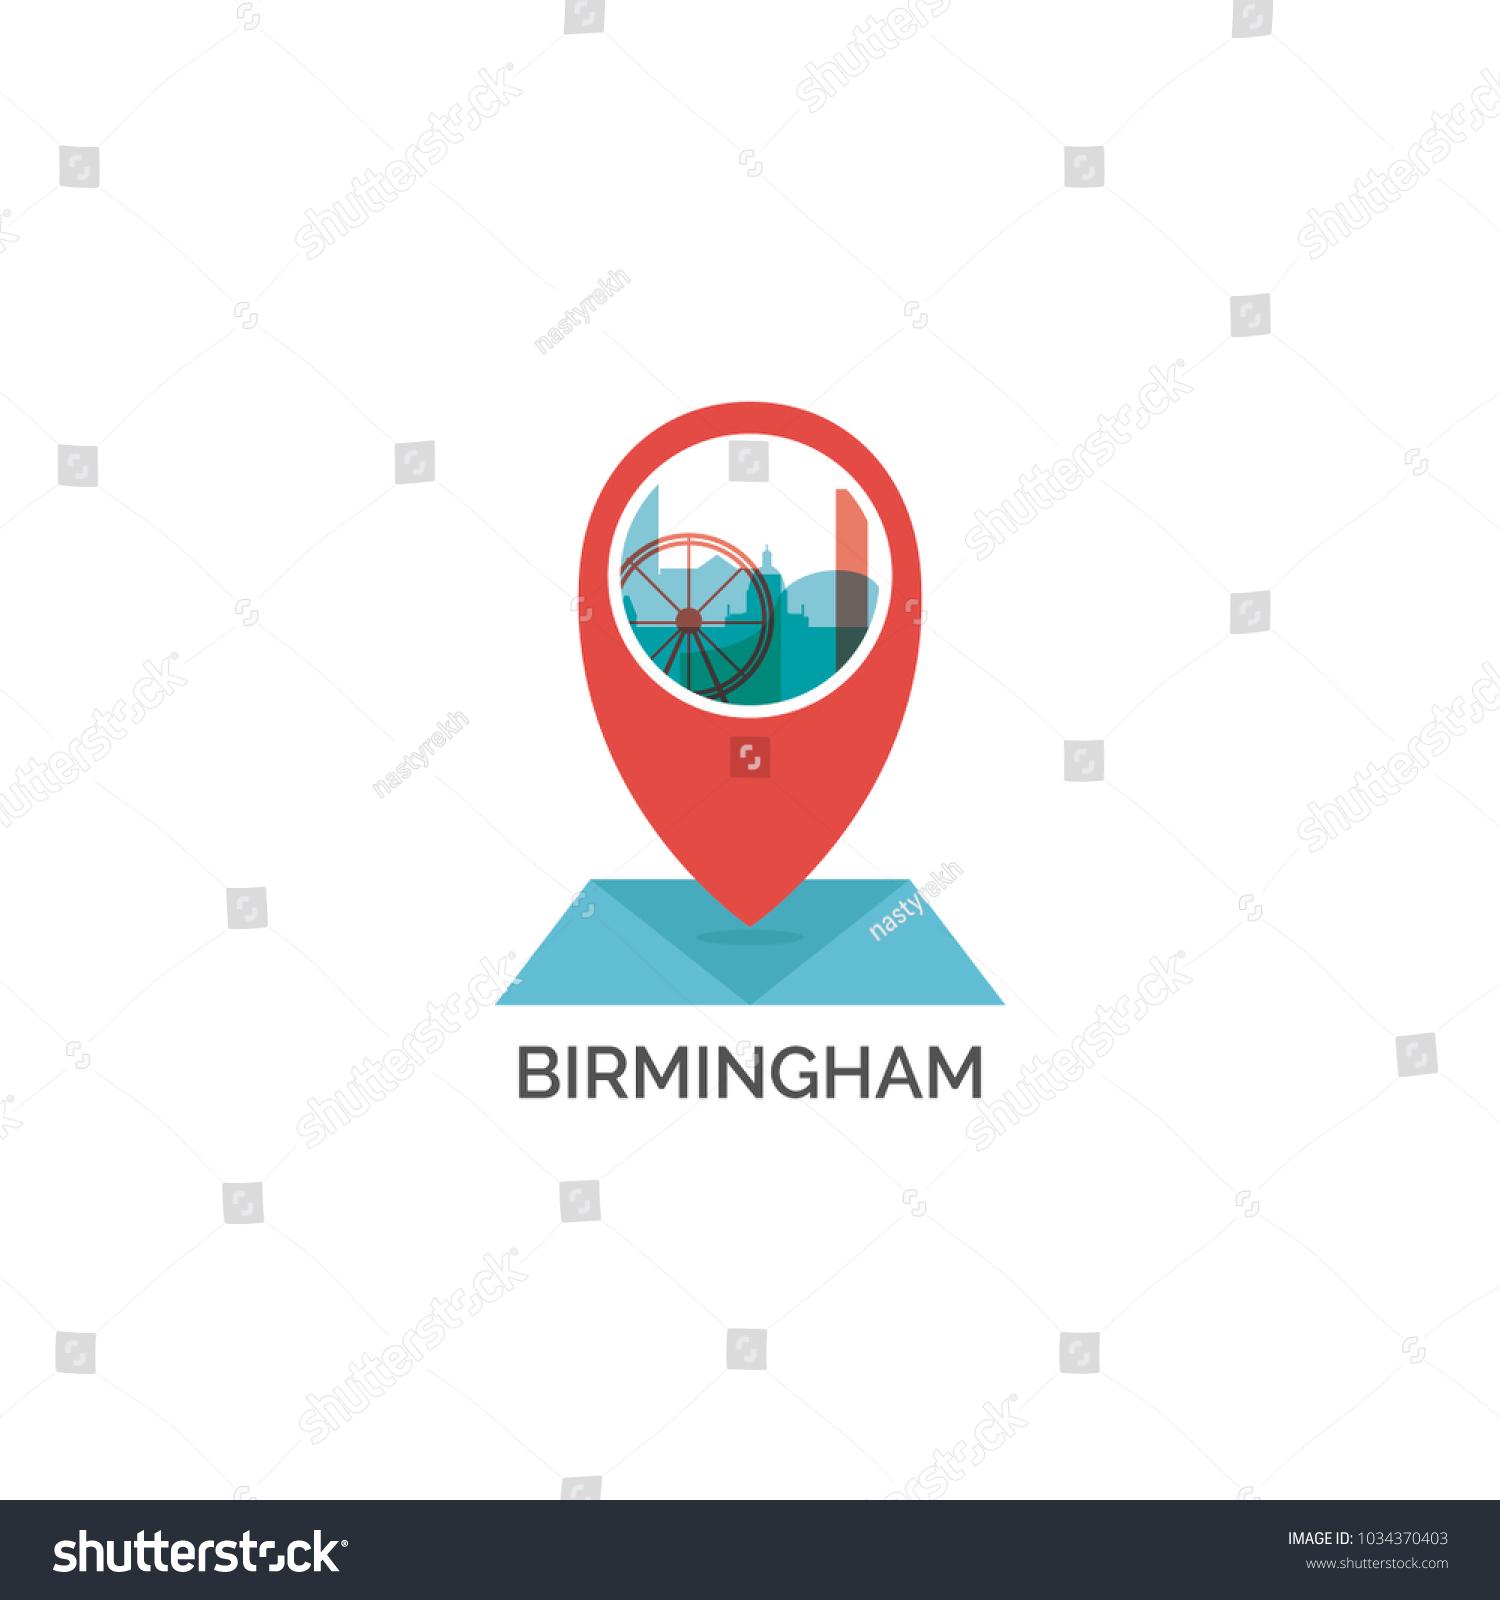 Britain England Map.Uk Great Britain England Birmingham Map Stock Vector Royalty Free